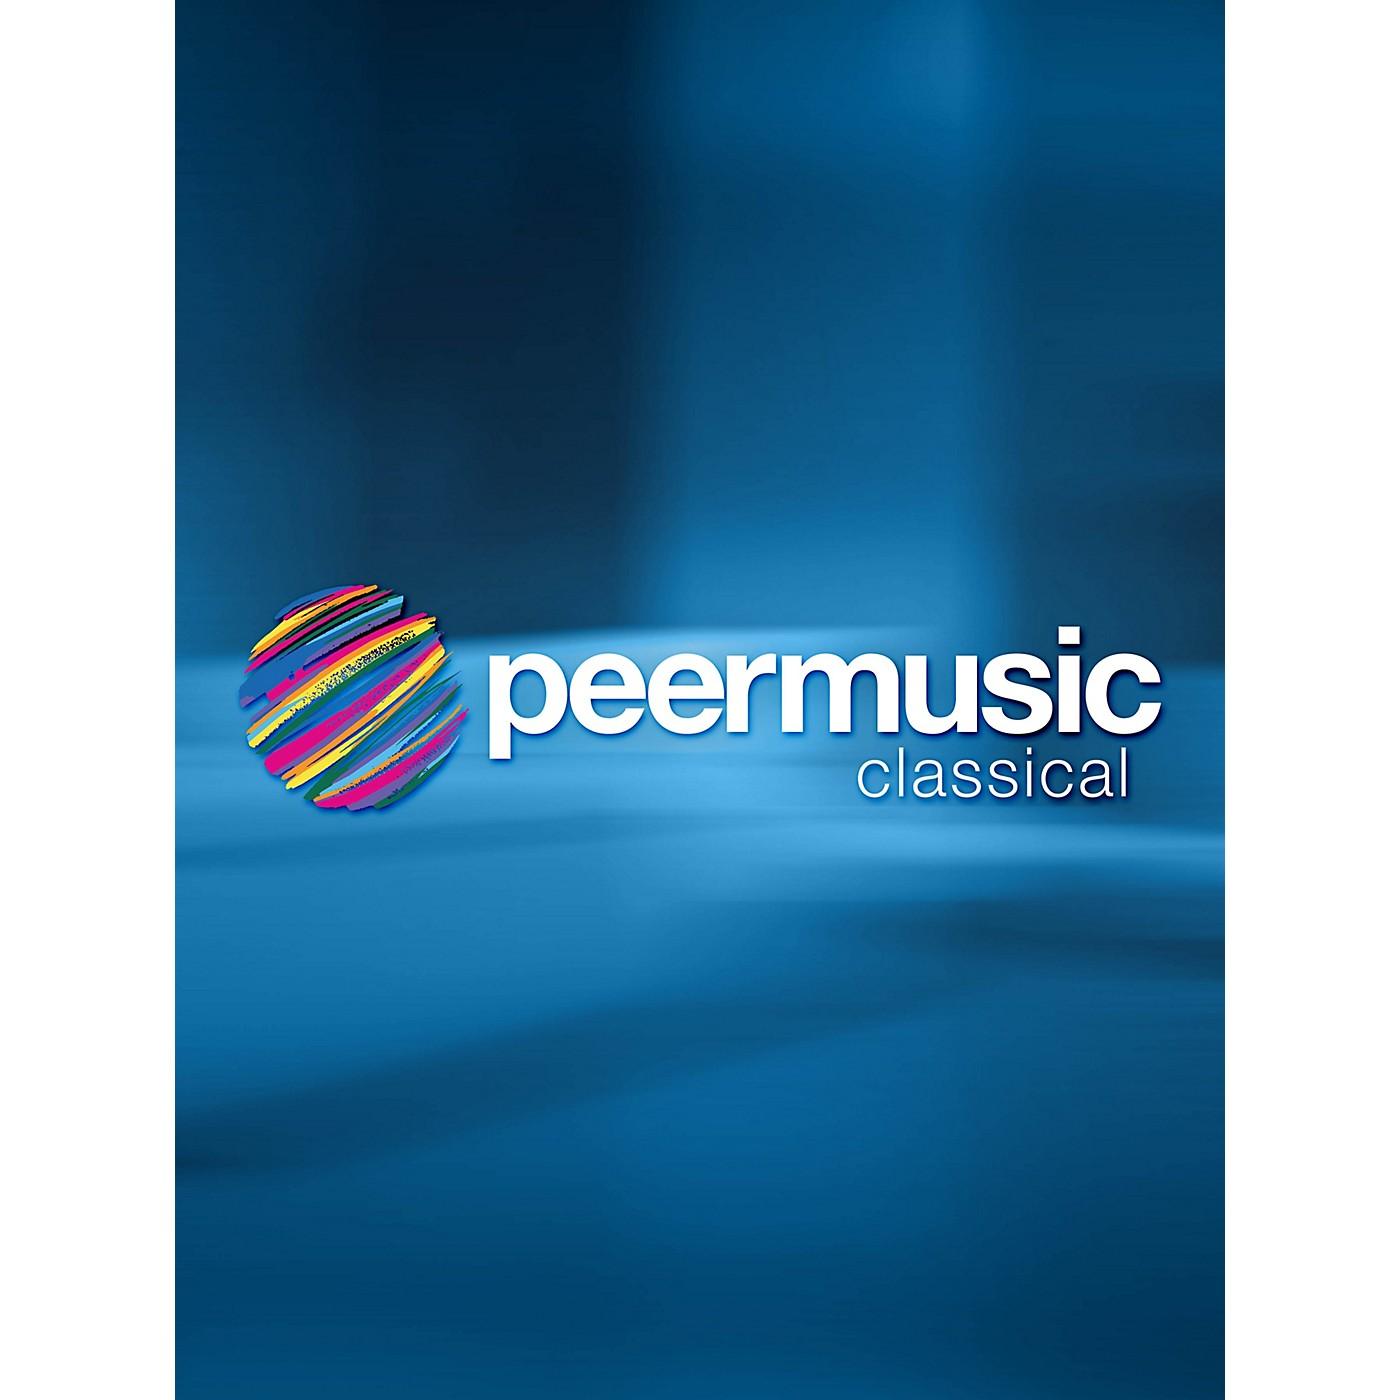 Peer Music Profound Utterances (Bassoon Solo) Peermusic Classical Series Book thumbnail